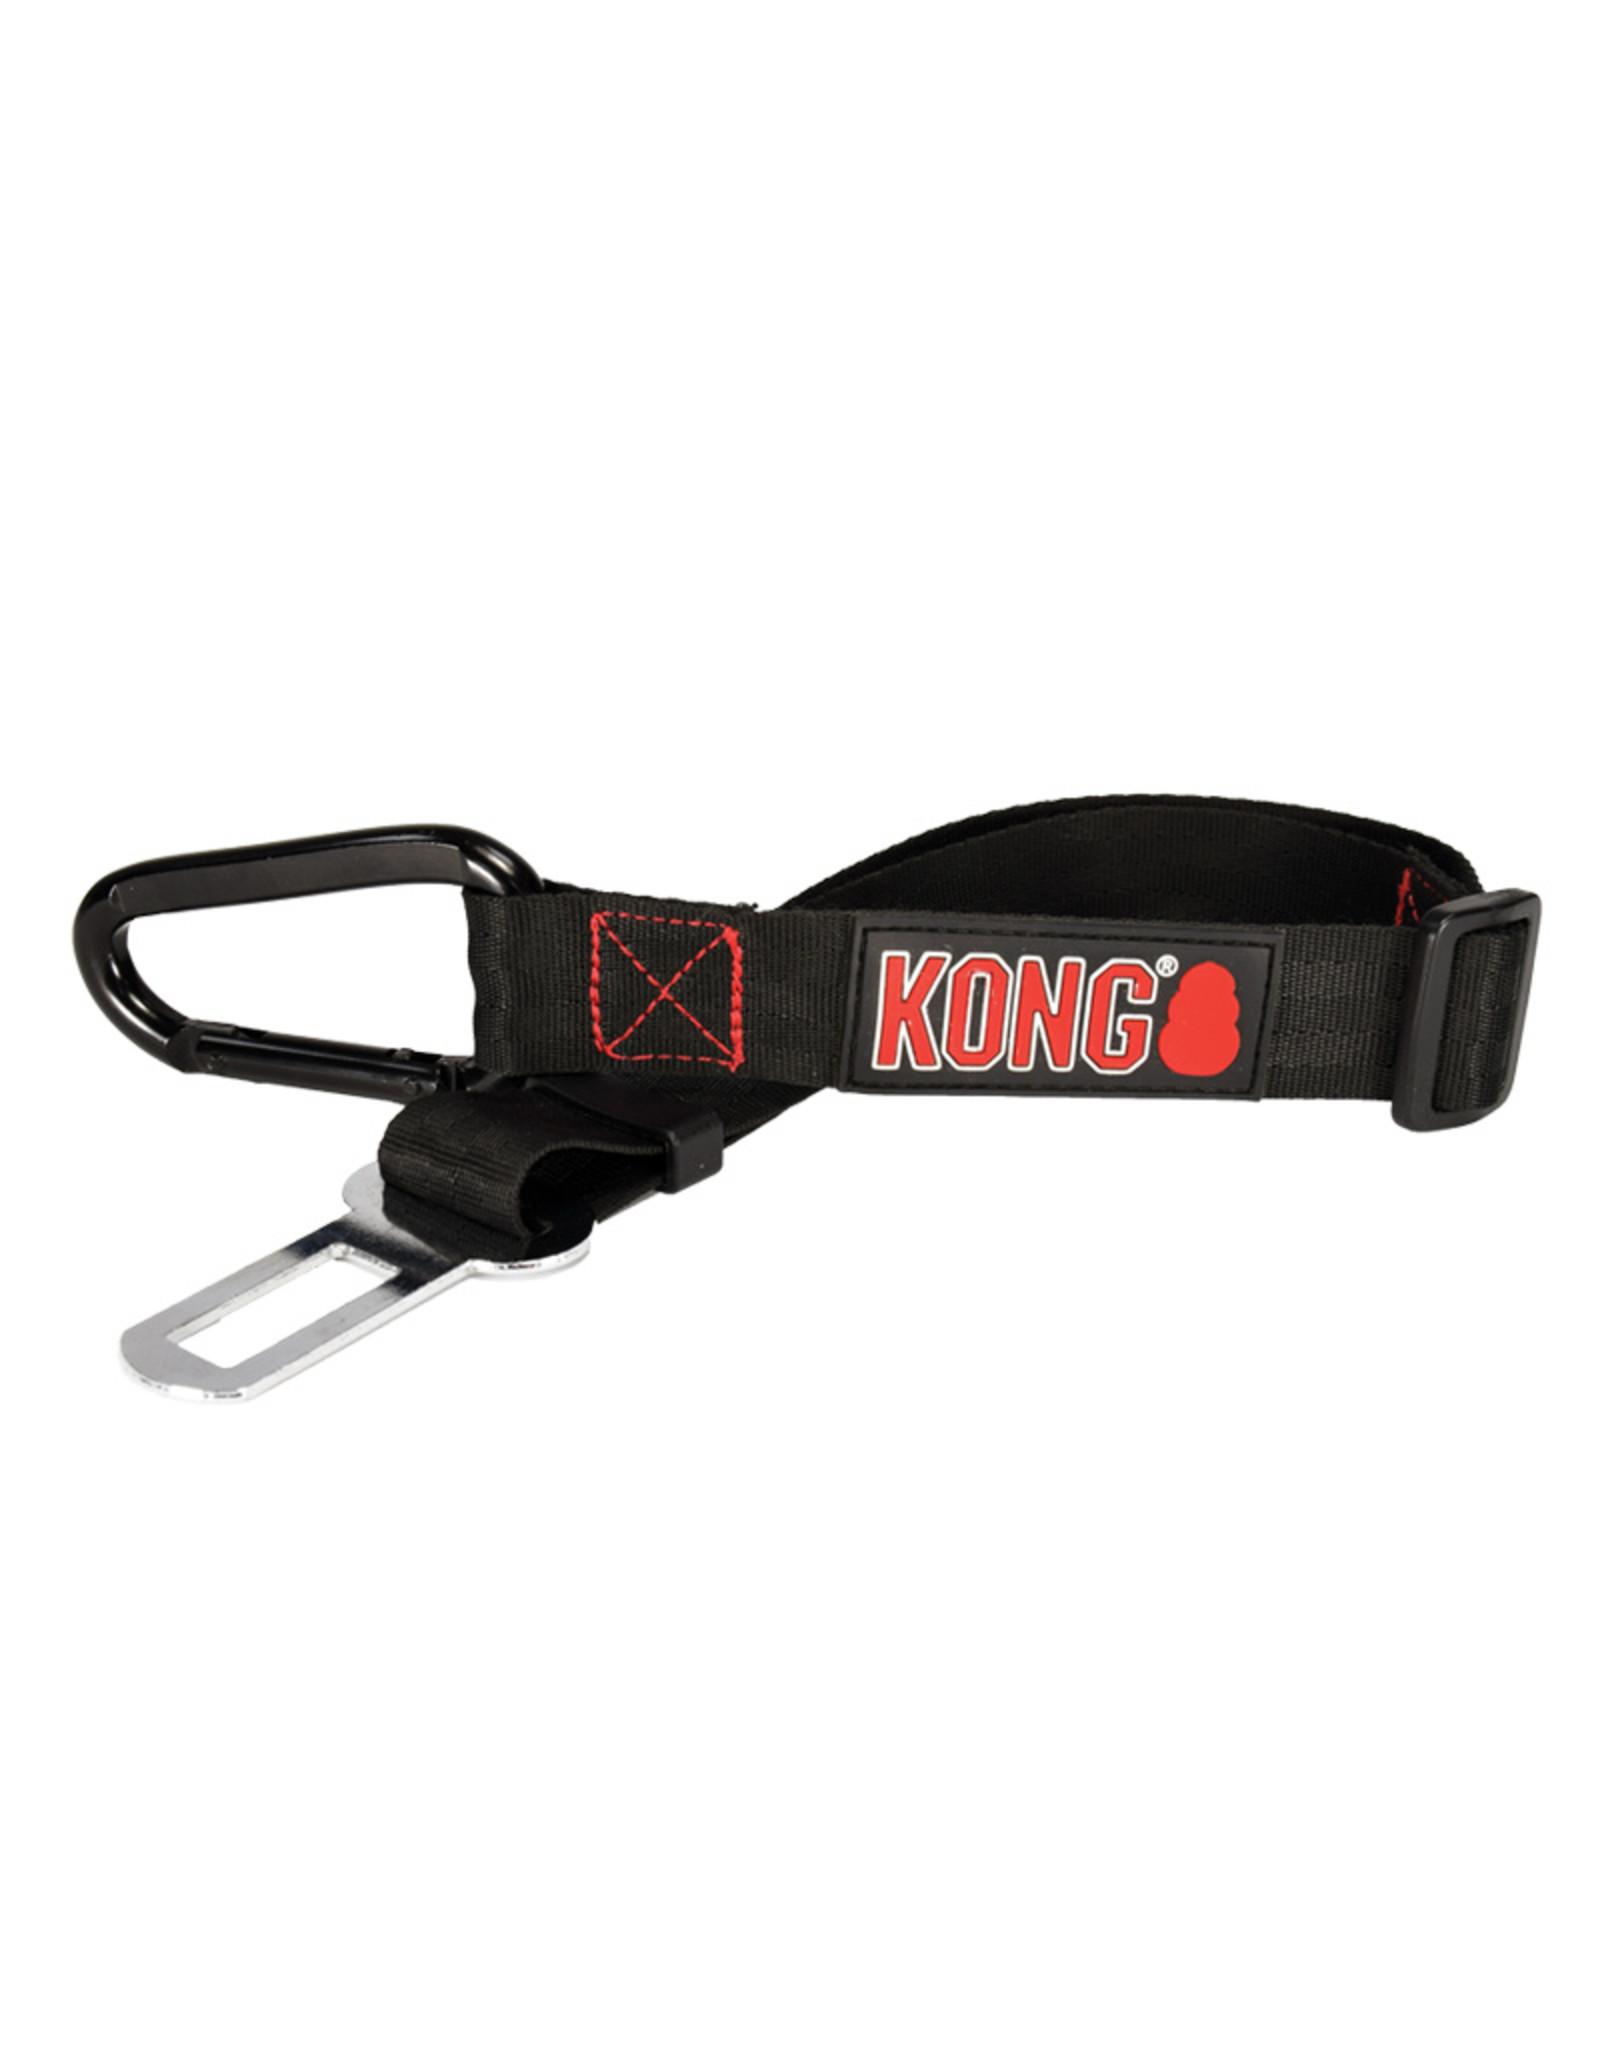 Kong Seat Belt Tether